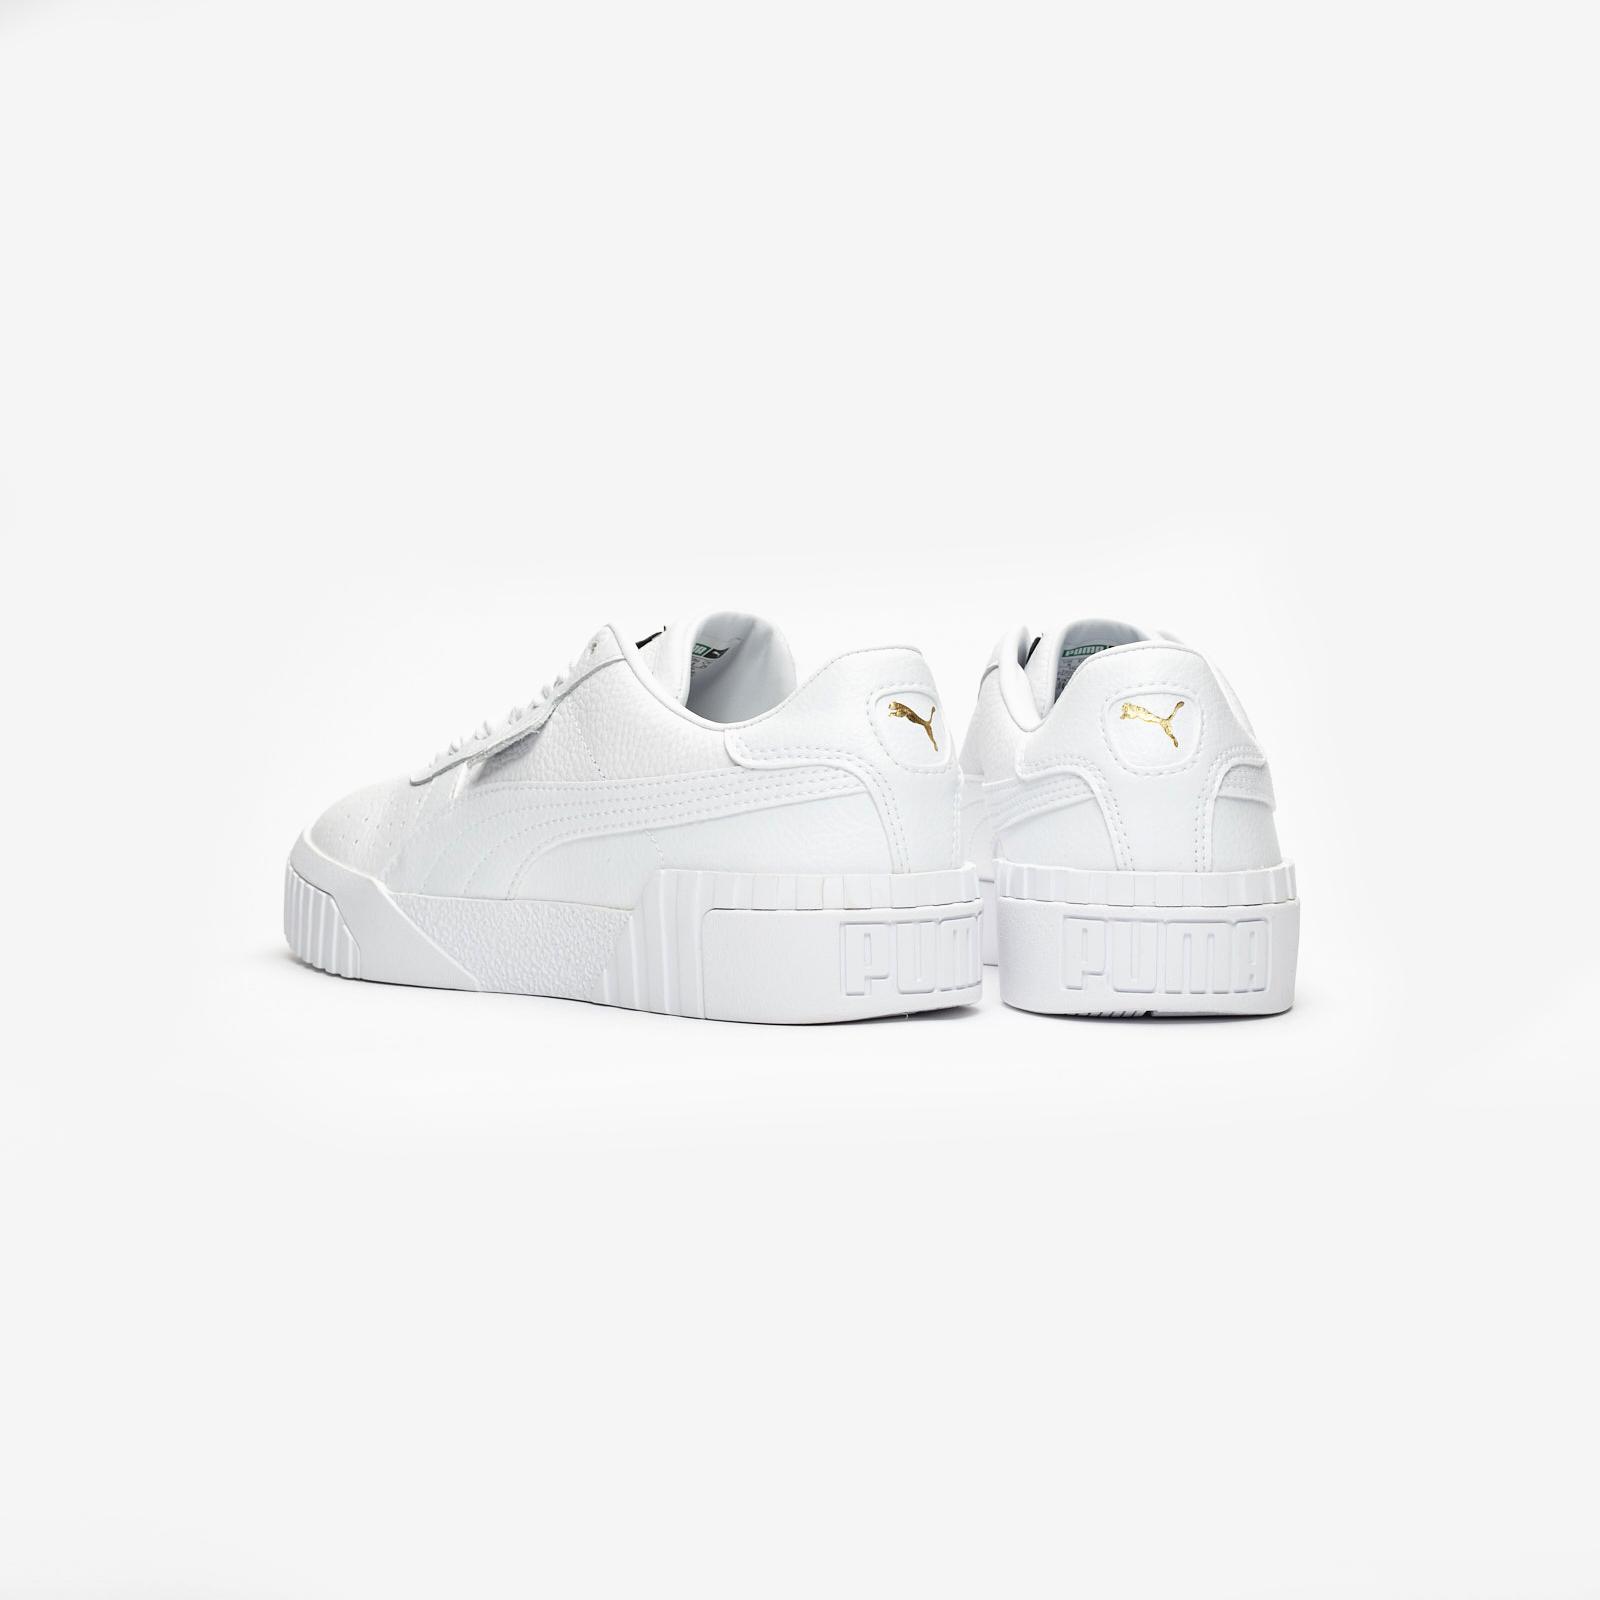 5e7632233c96aa Puma Cali - 369155-01 - Sneakersnstuff